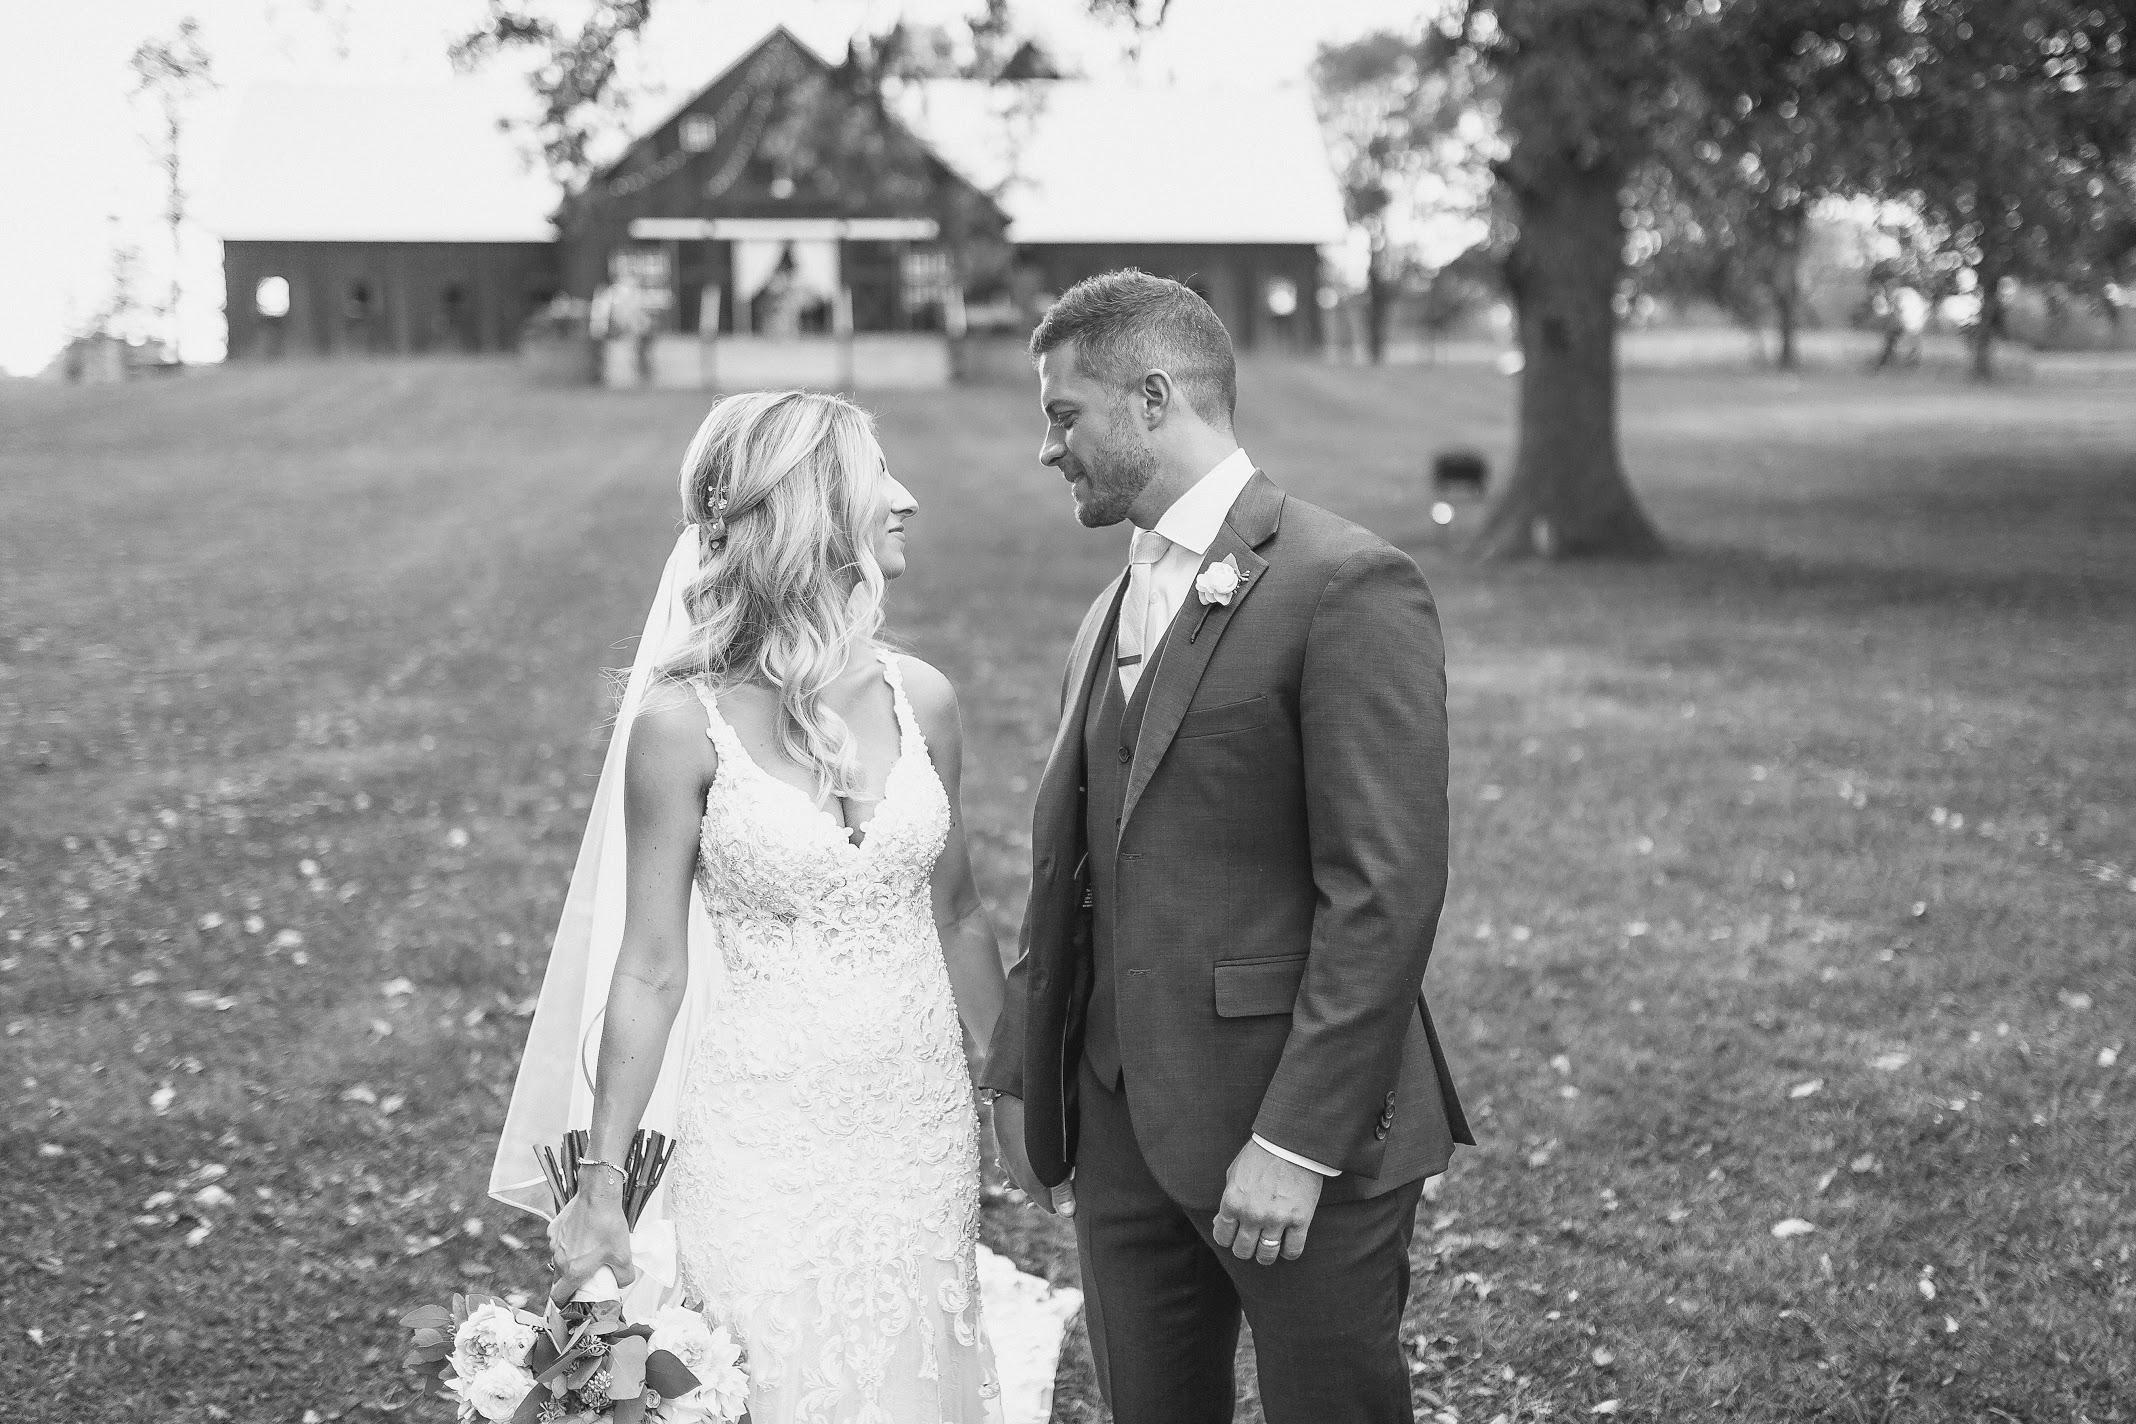 The Hirschmann's wedding